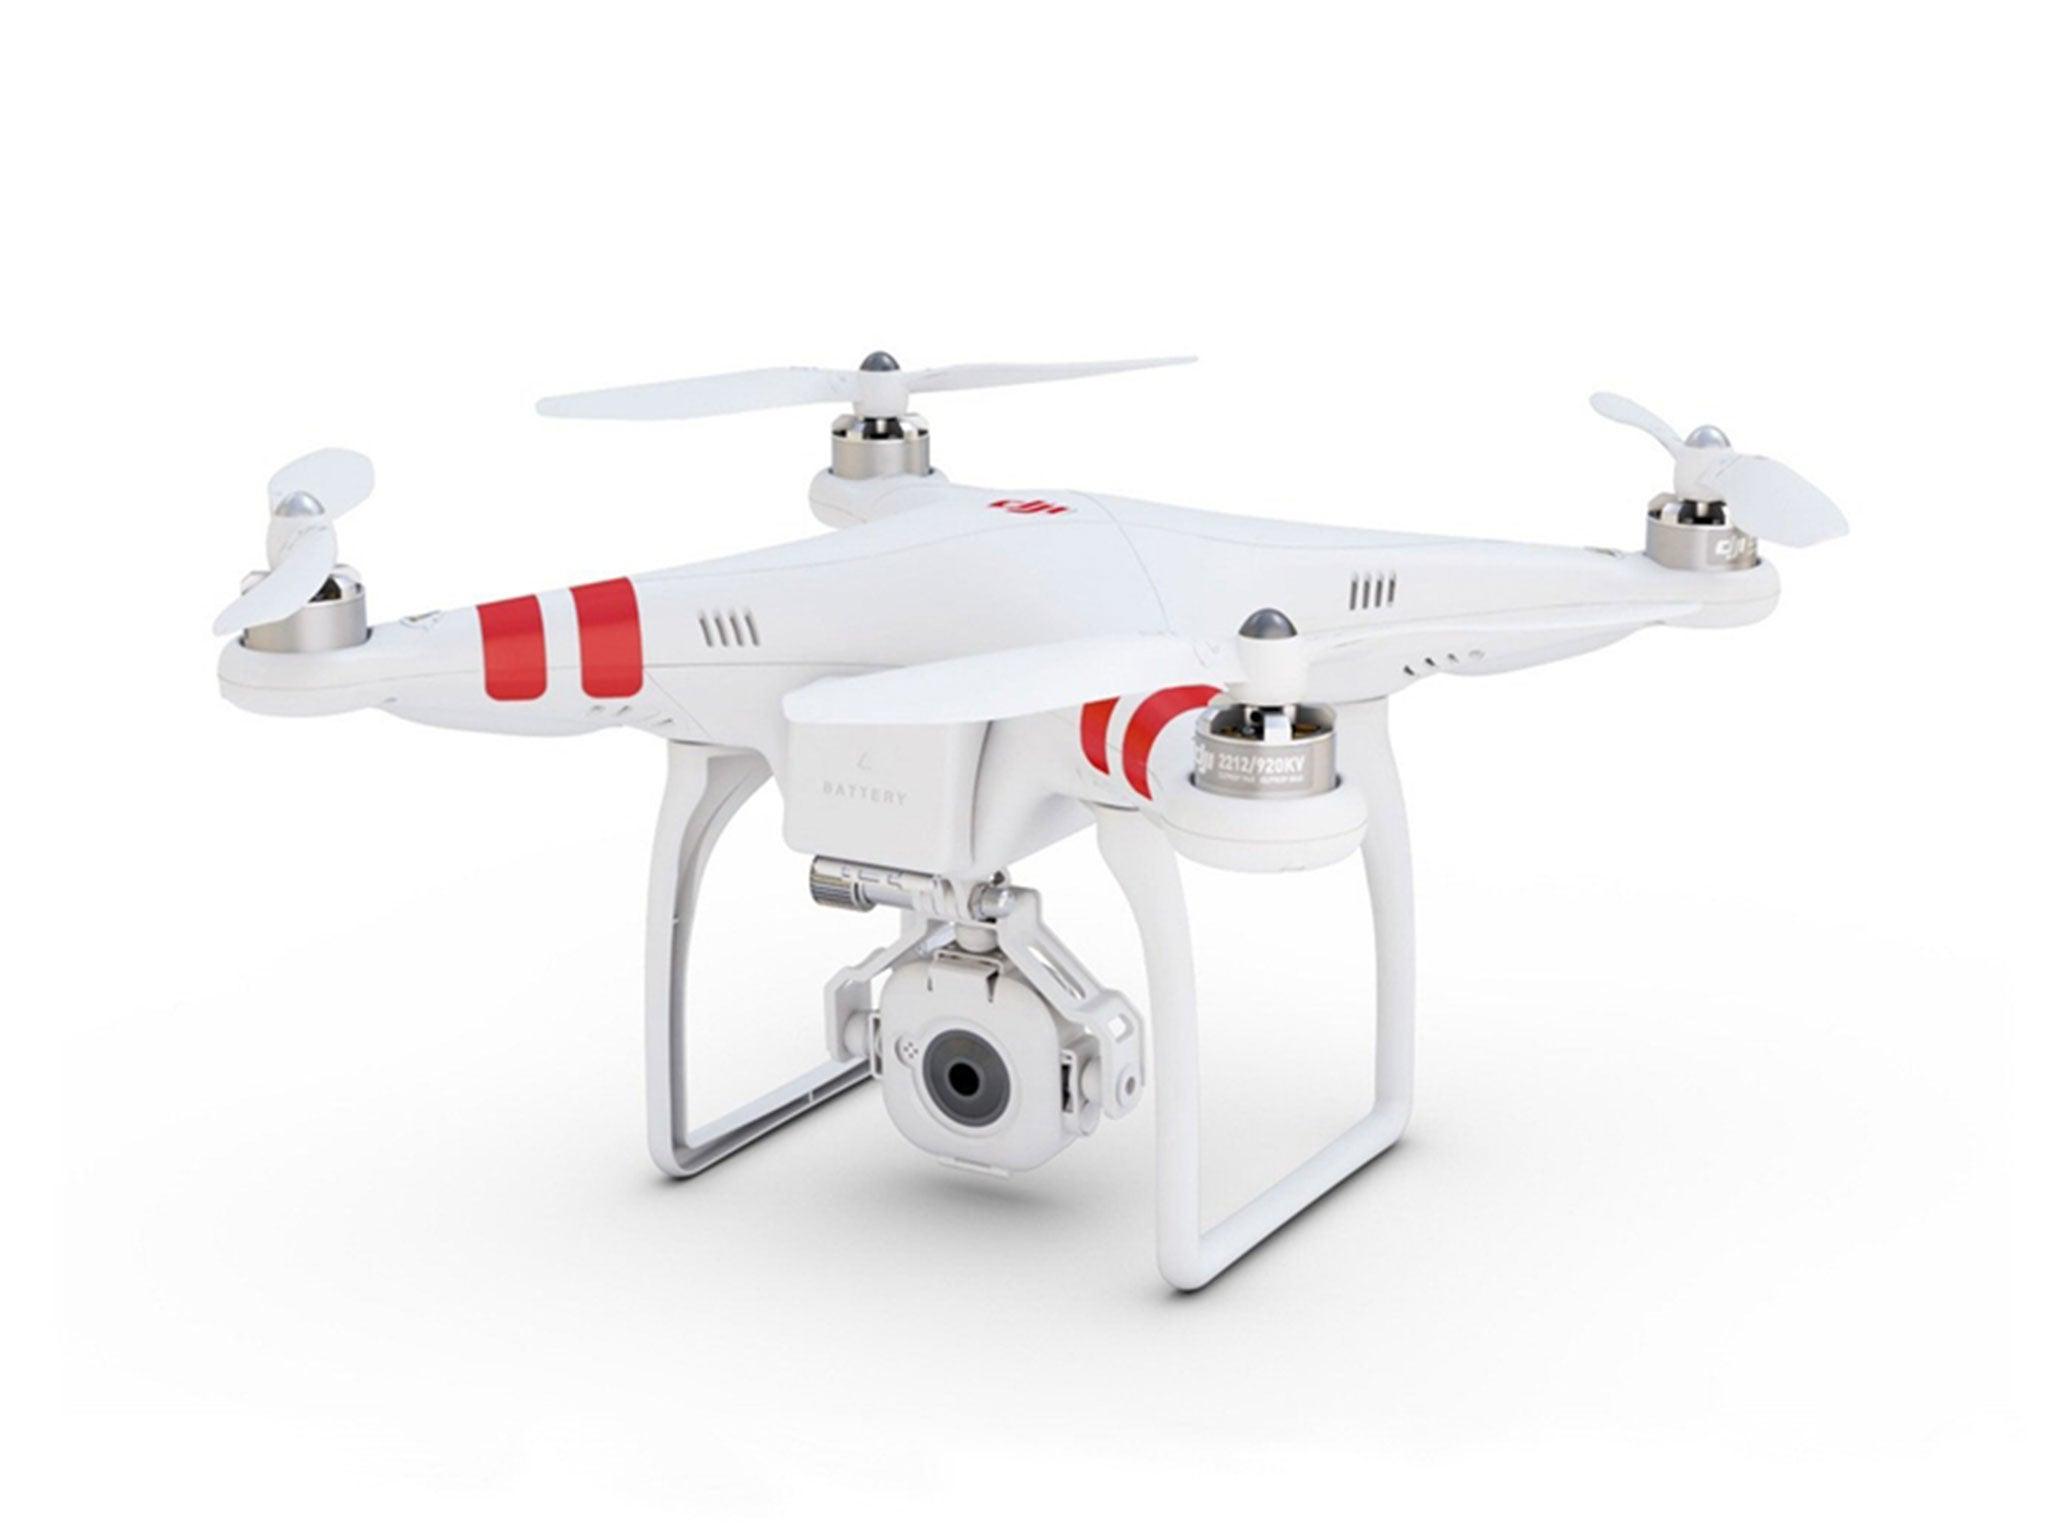 Deforestation: British firm developing tree-planting drone